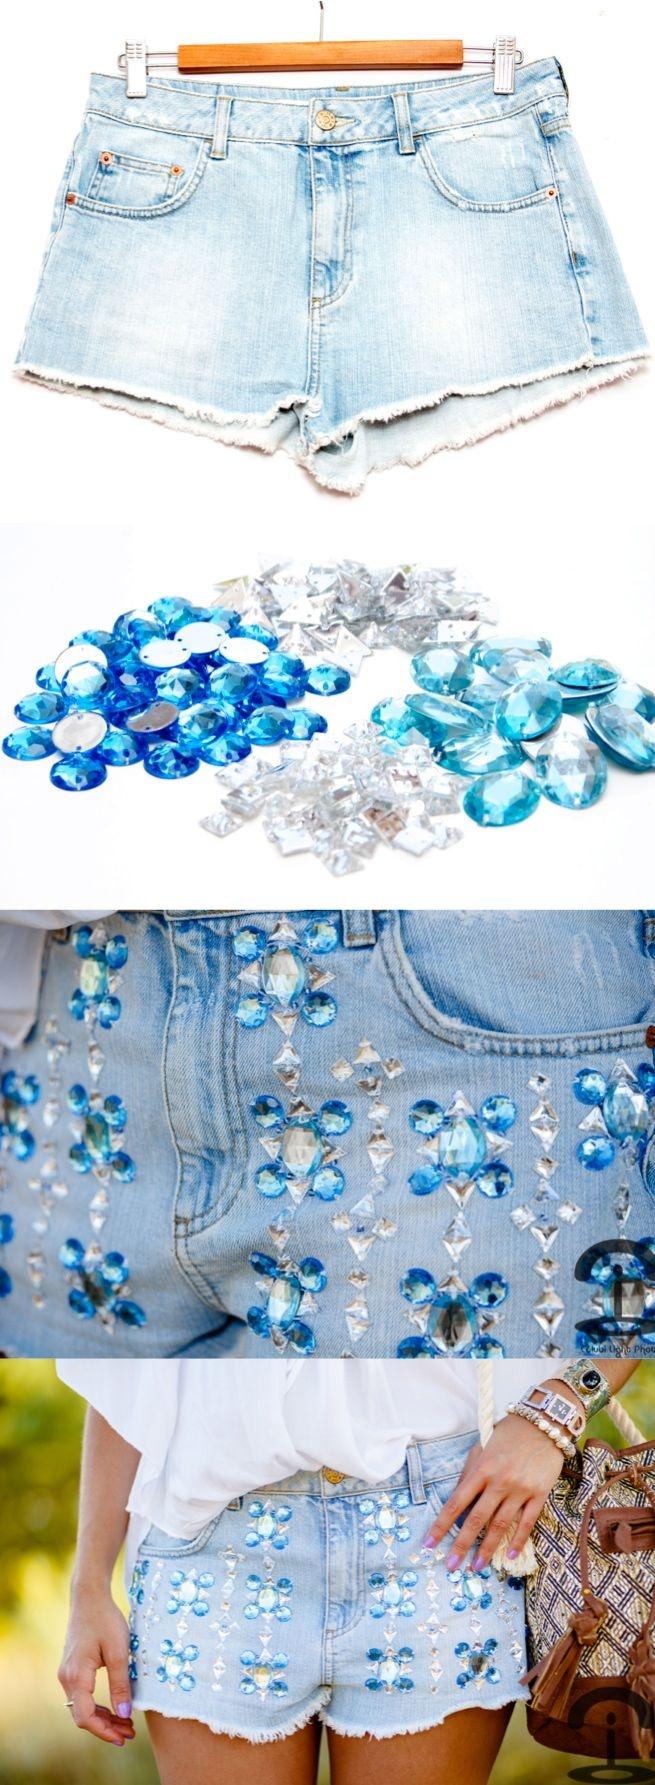 DIY: Embellished shorts